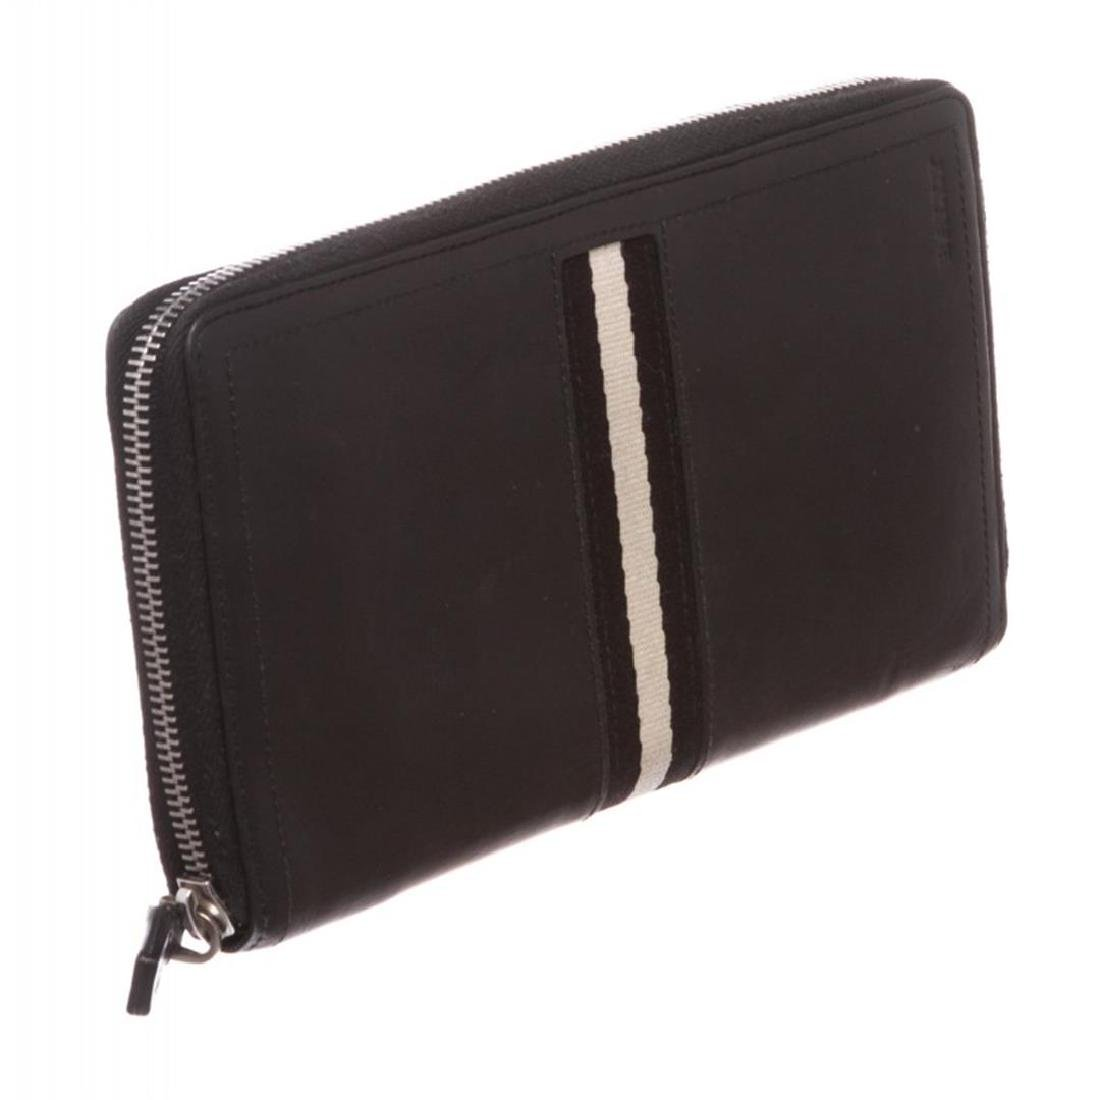 Bally Black Leather Long Zipper Wallet - 2